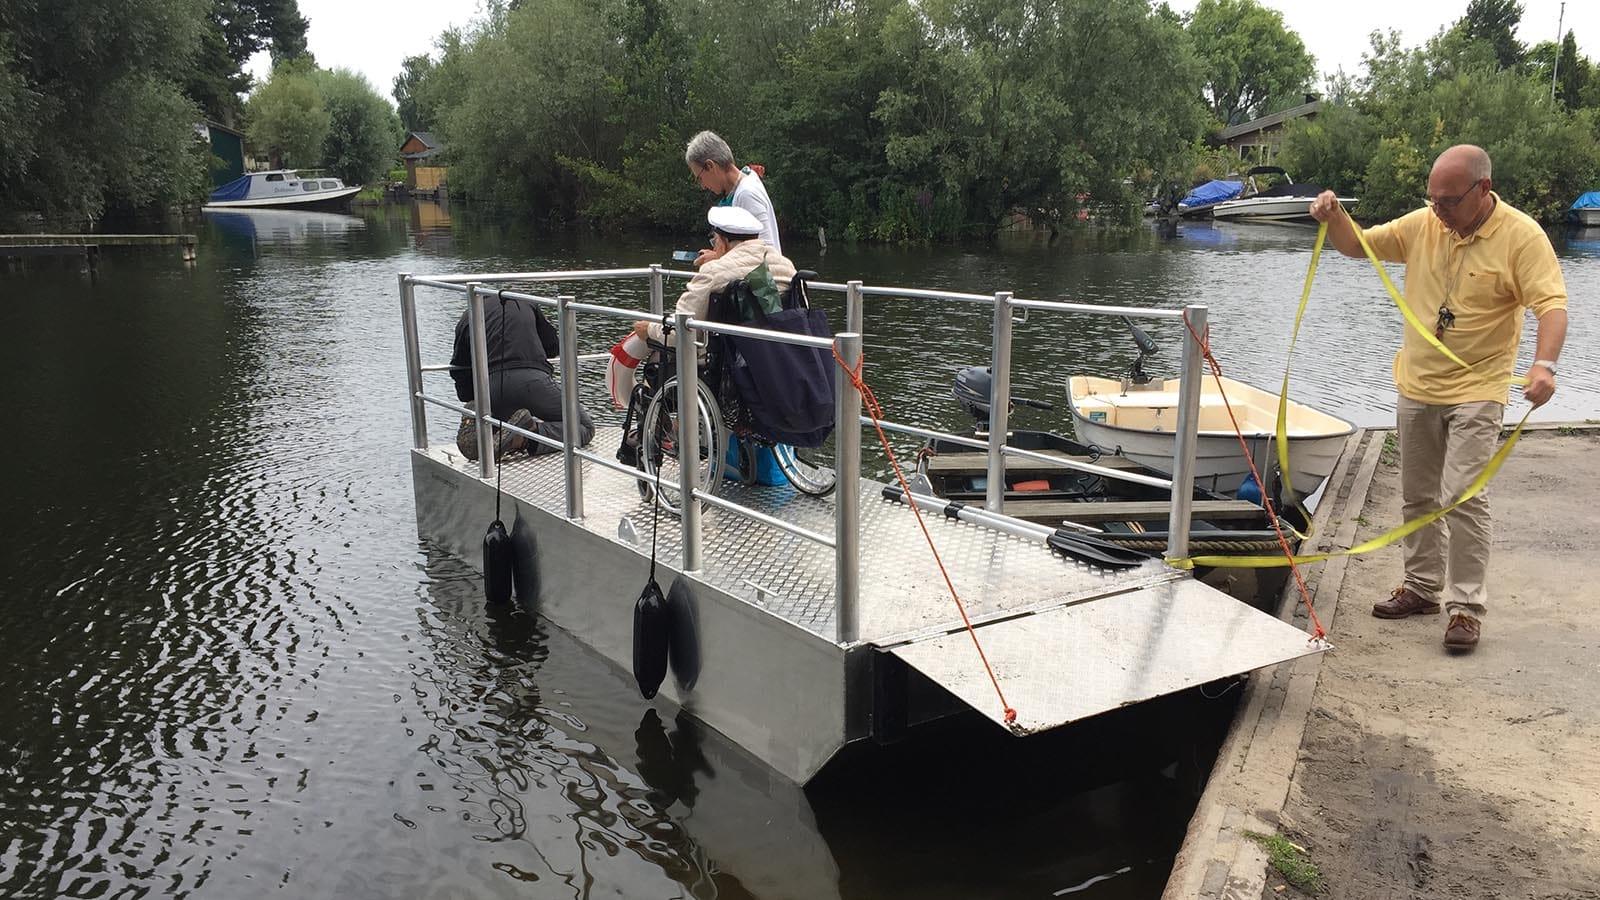 AluminiumJon.nl-Ponton 4 meter-Aluminium custom build pontoons a.o. suitable for port services